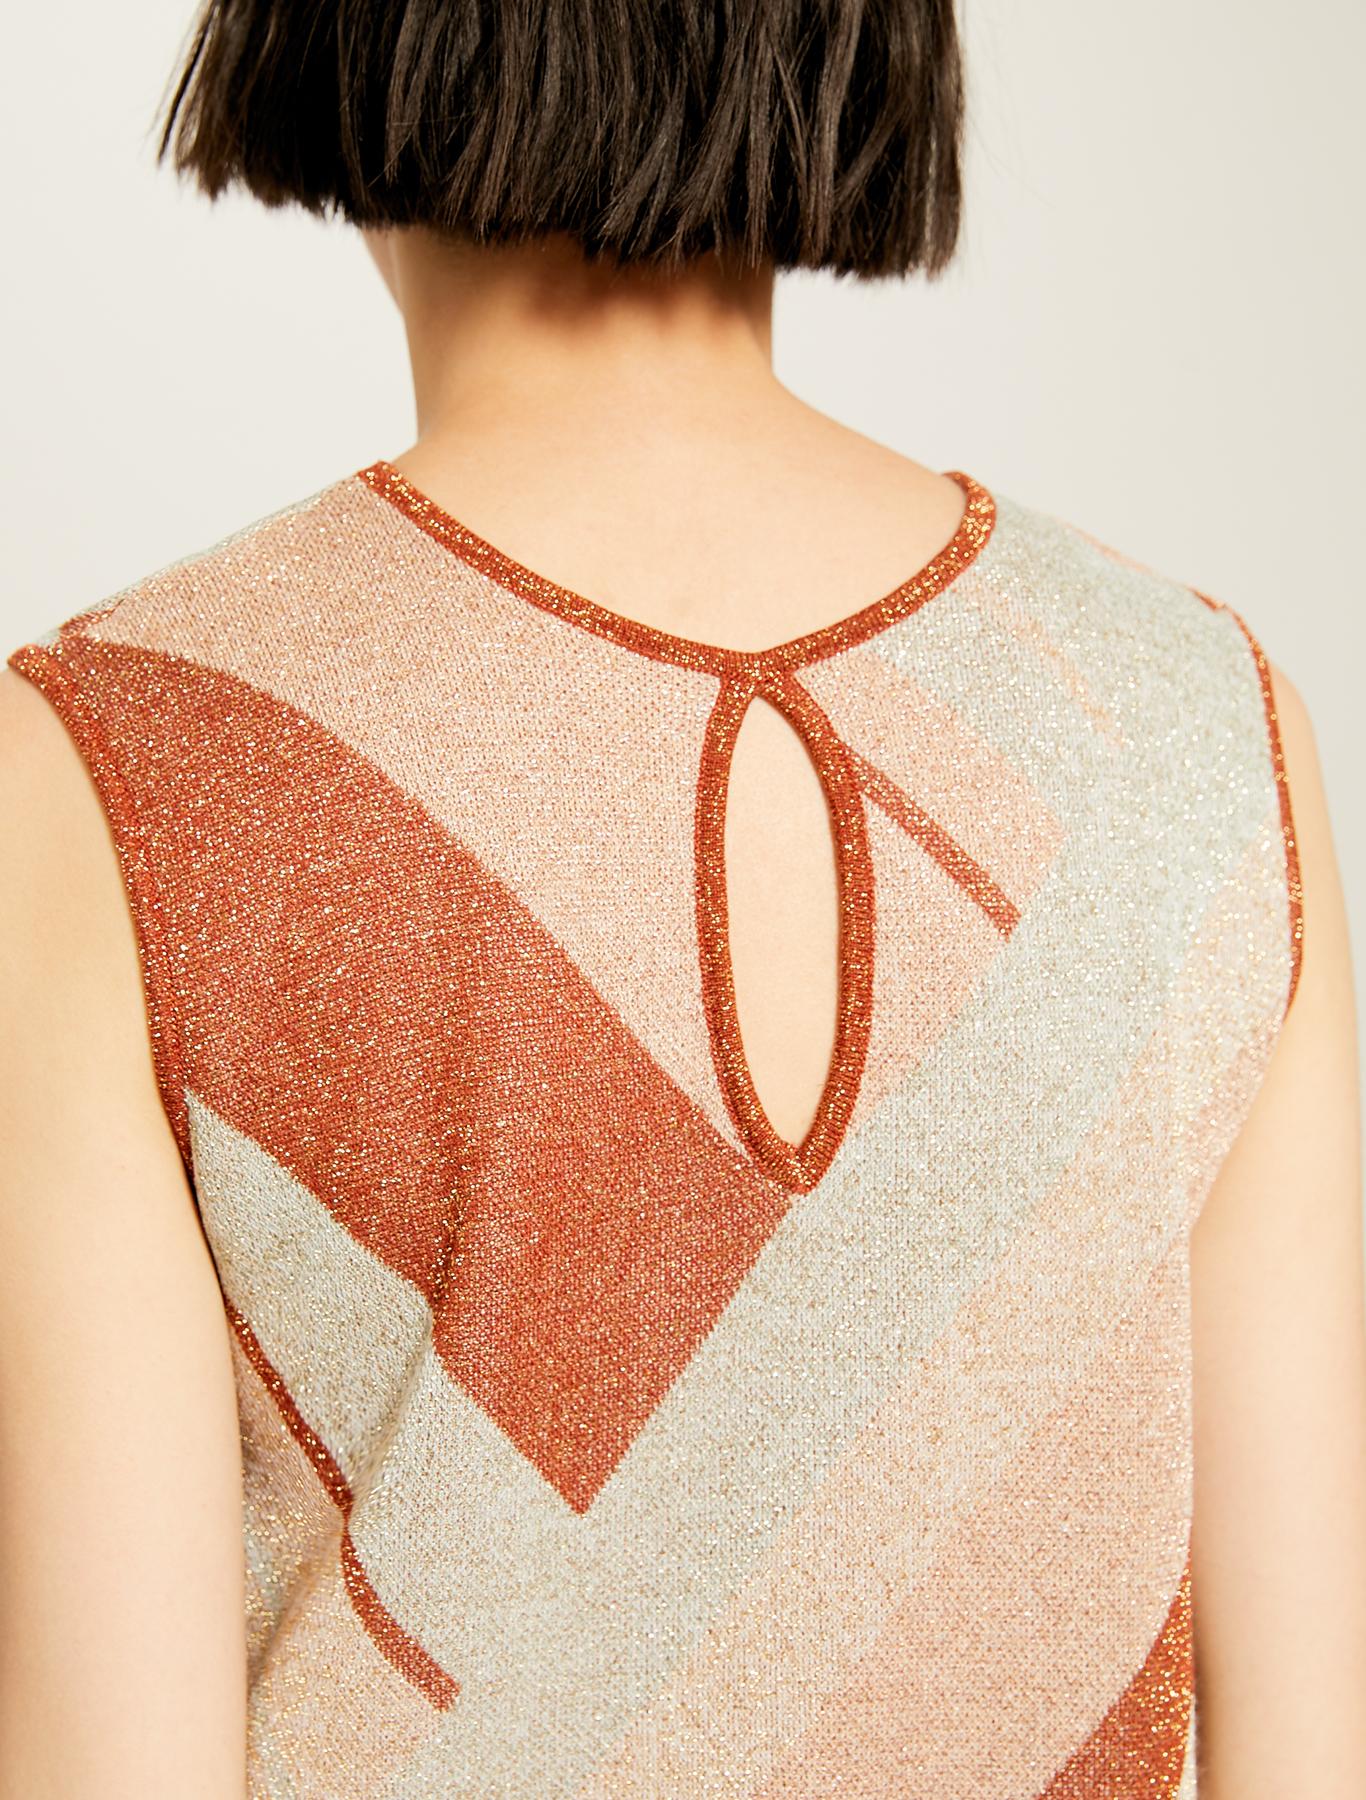 Lamé jacquard knit top - rust - pennyblack